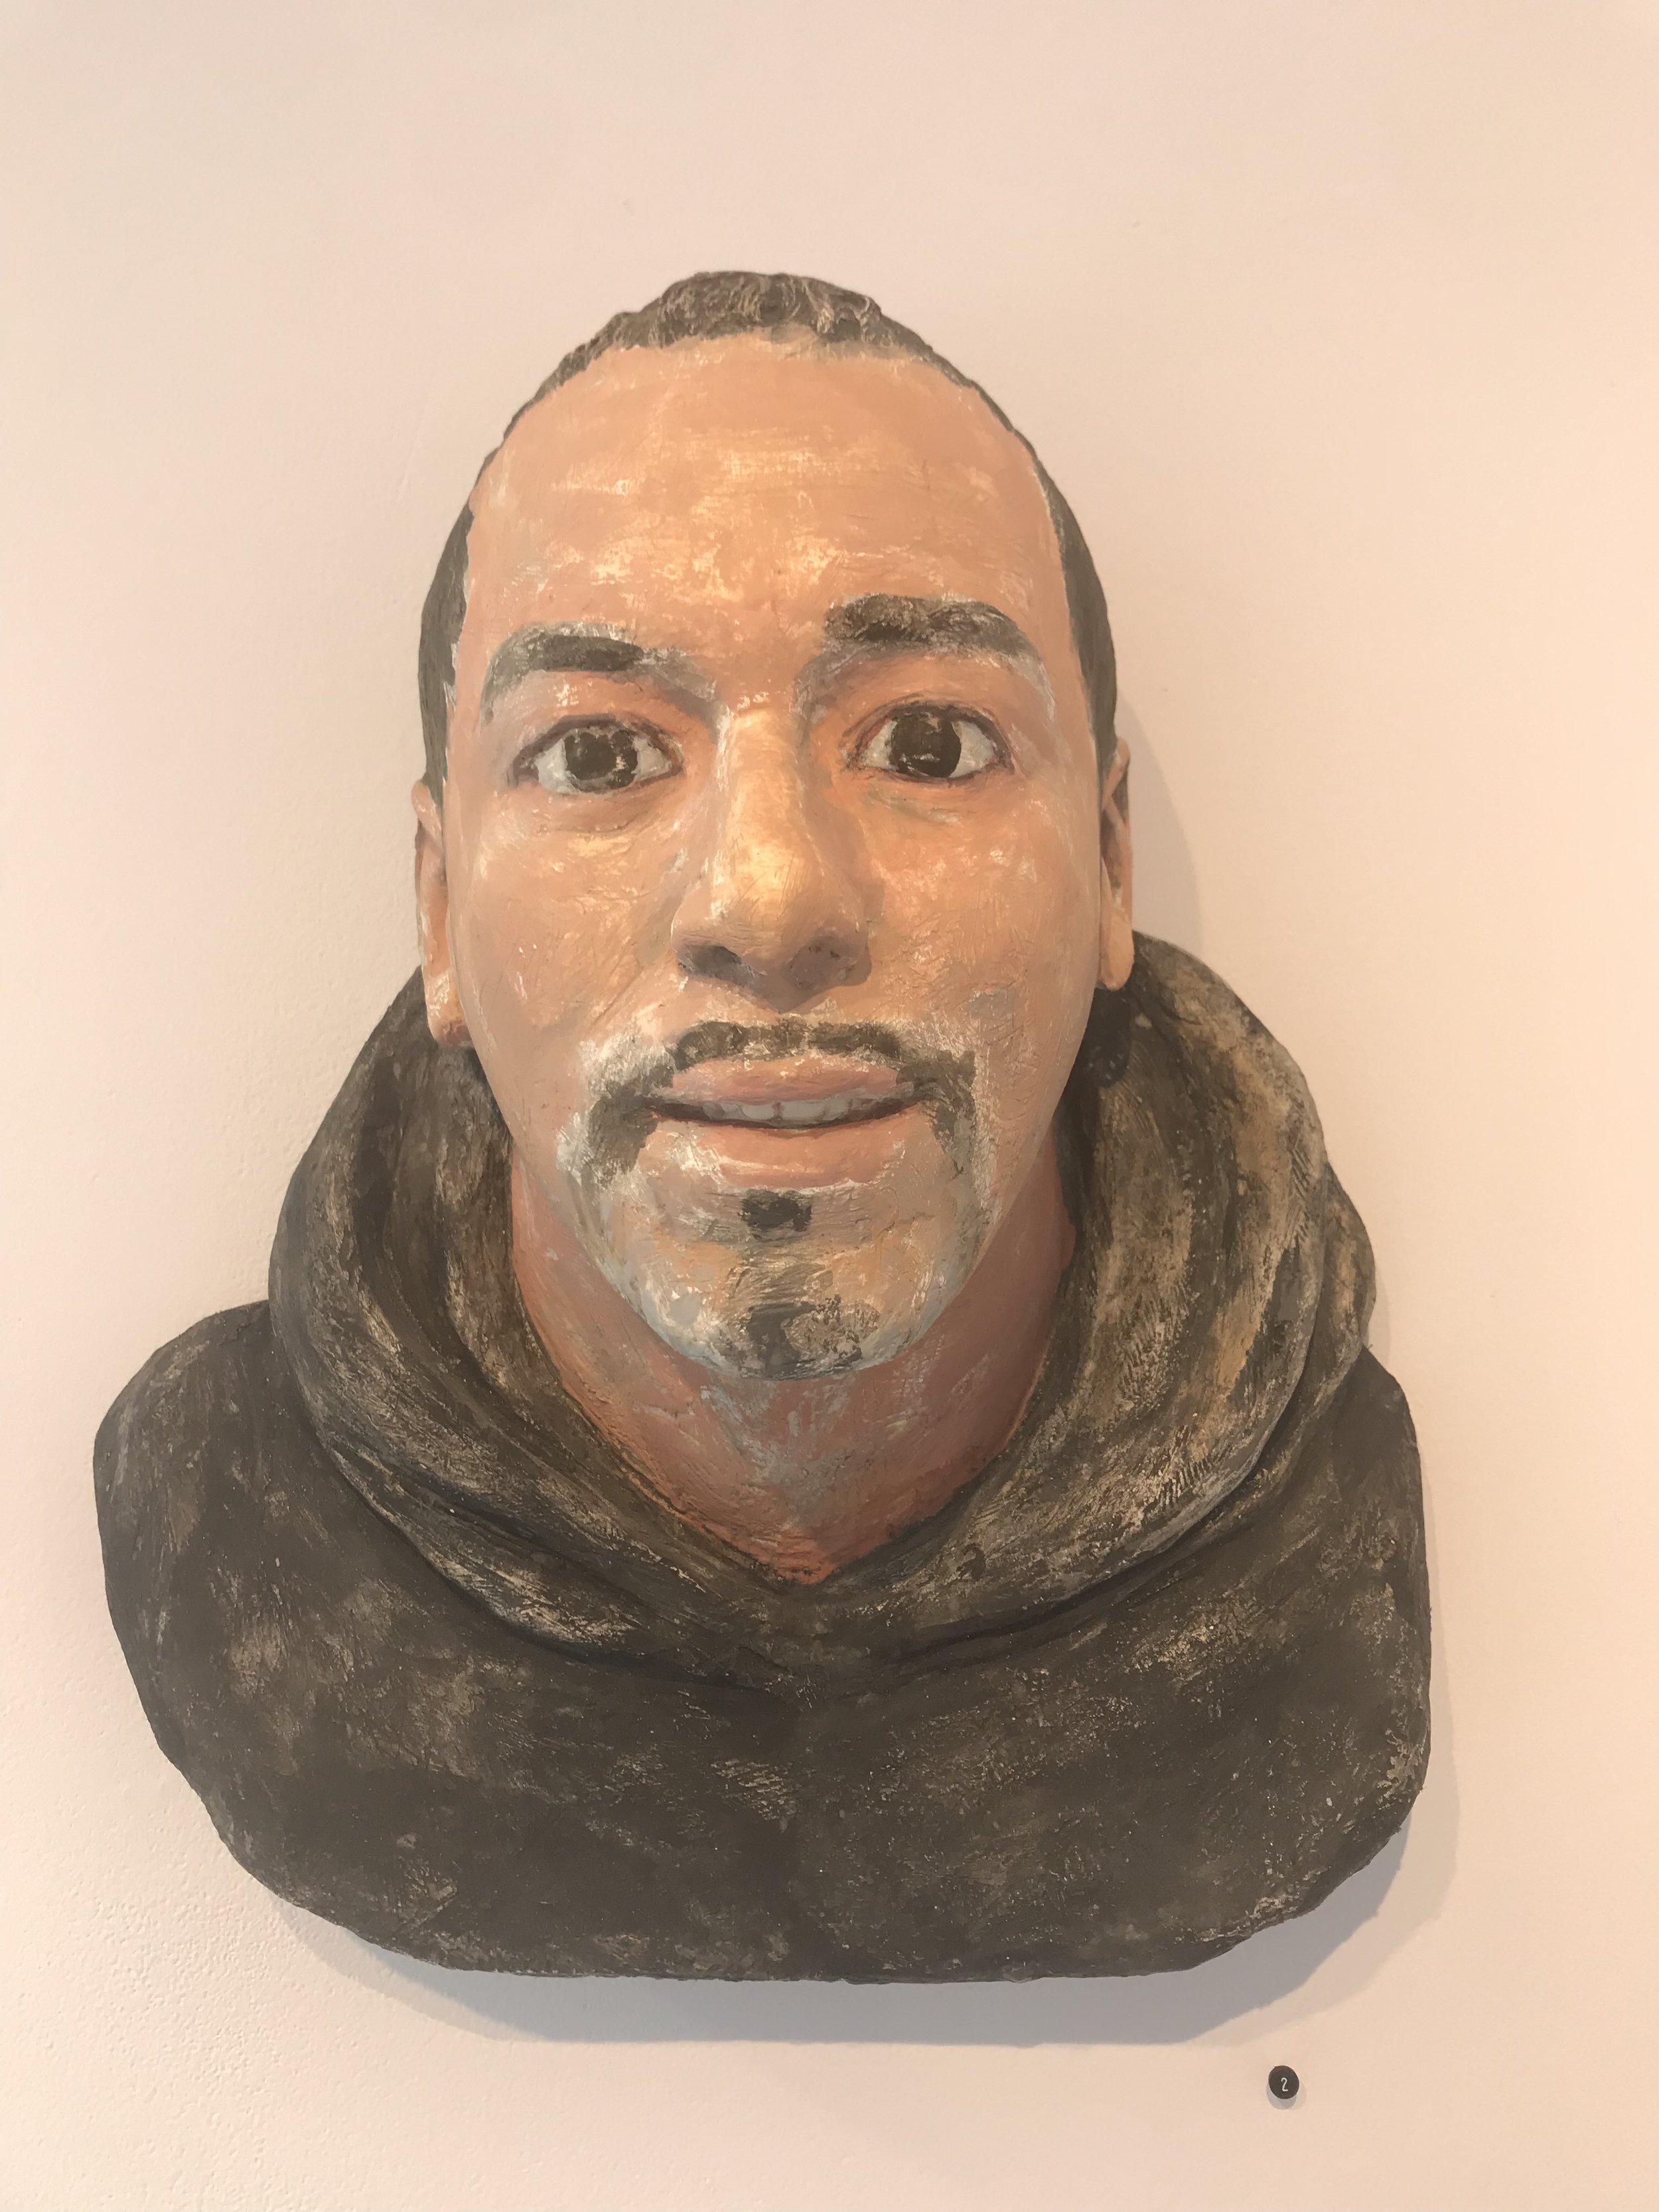 "John Ahearn BIO w. Black Hoodie Acrylic on Plaster 16x16x8"""